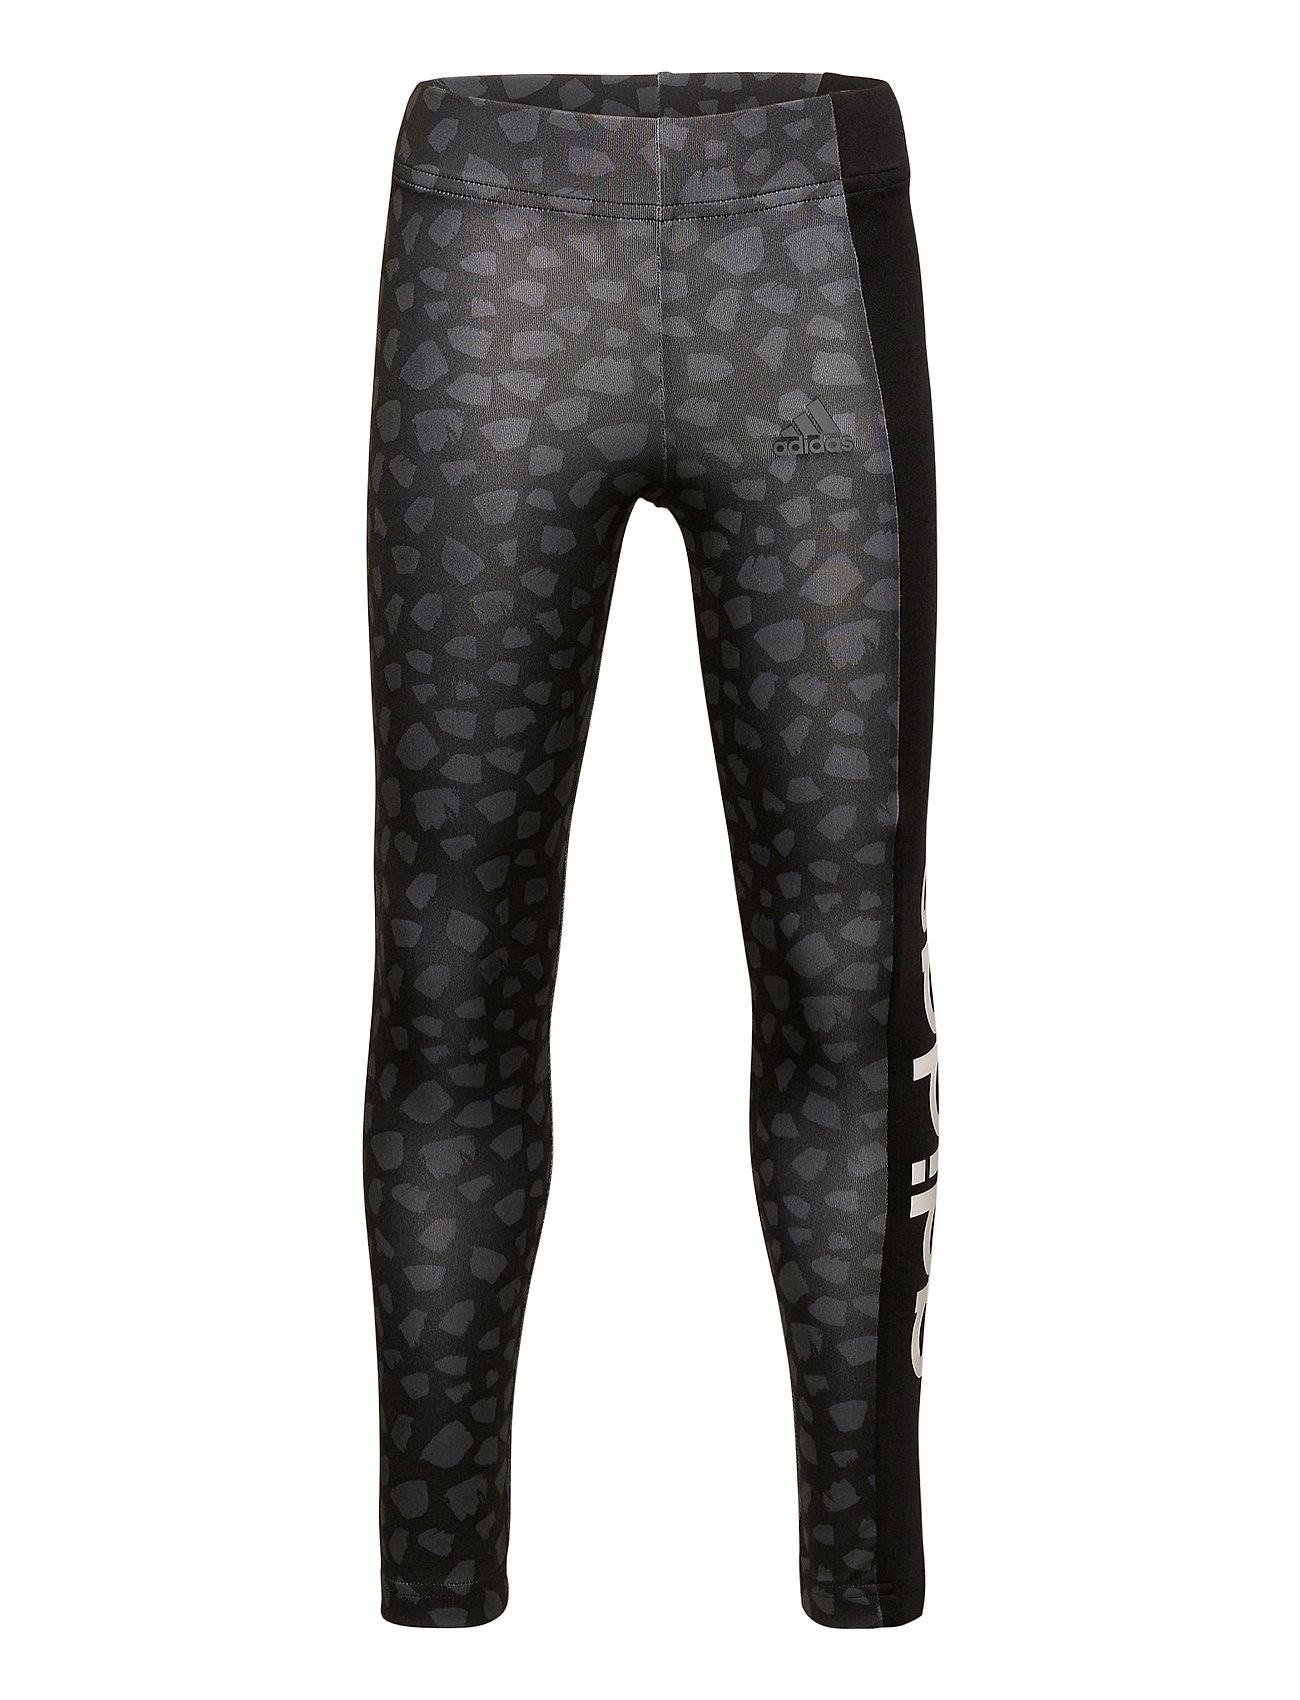 Image of Yg Cb Tight Leggings Sort Adidas Performance (3439041241)